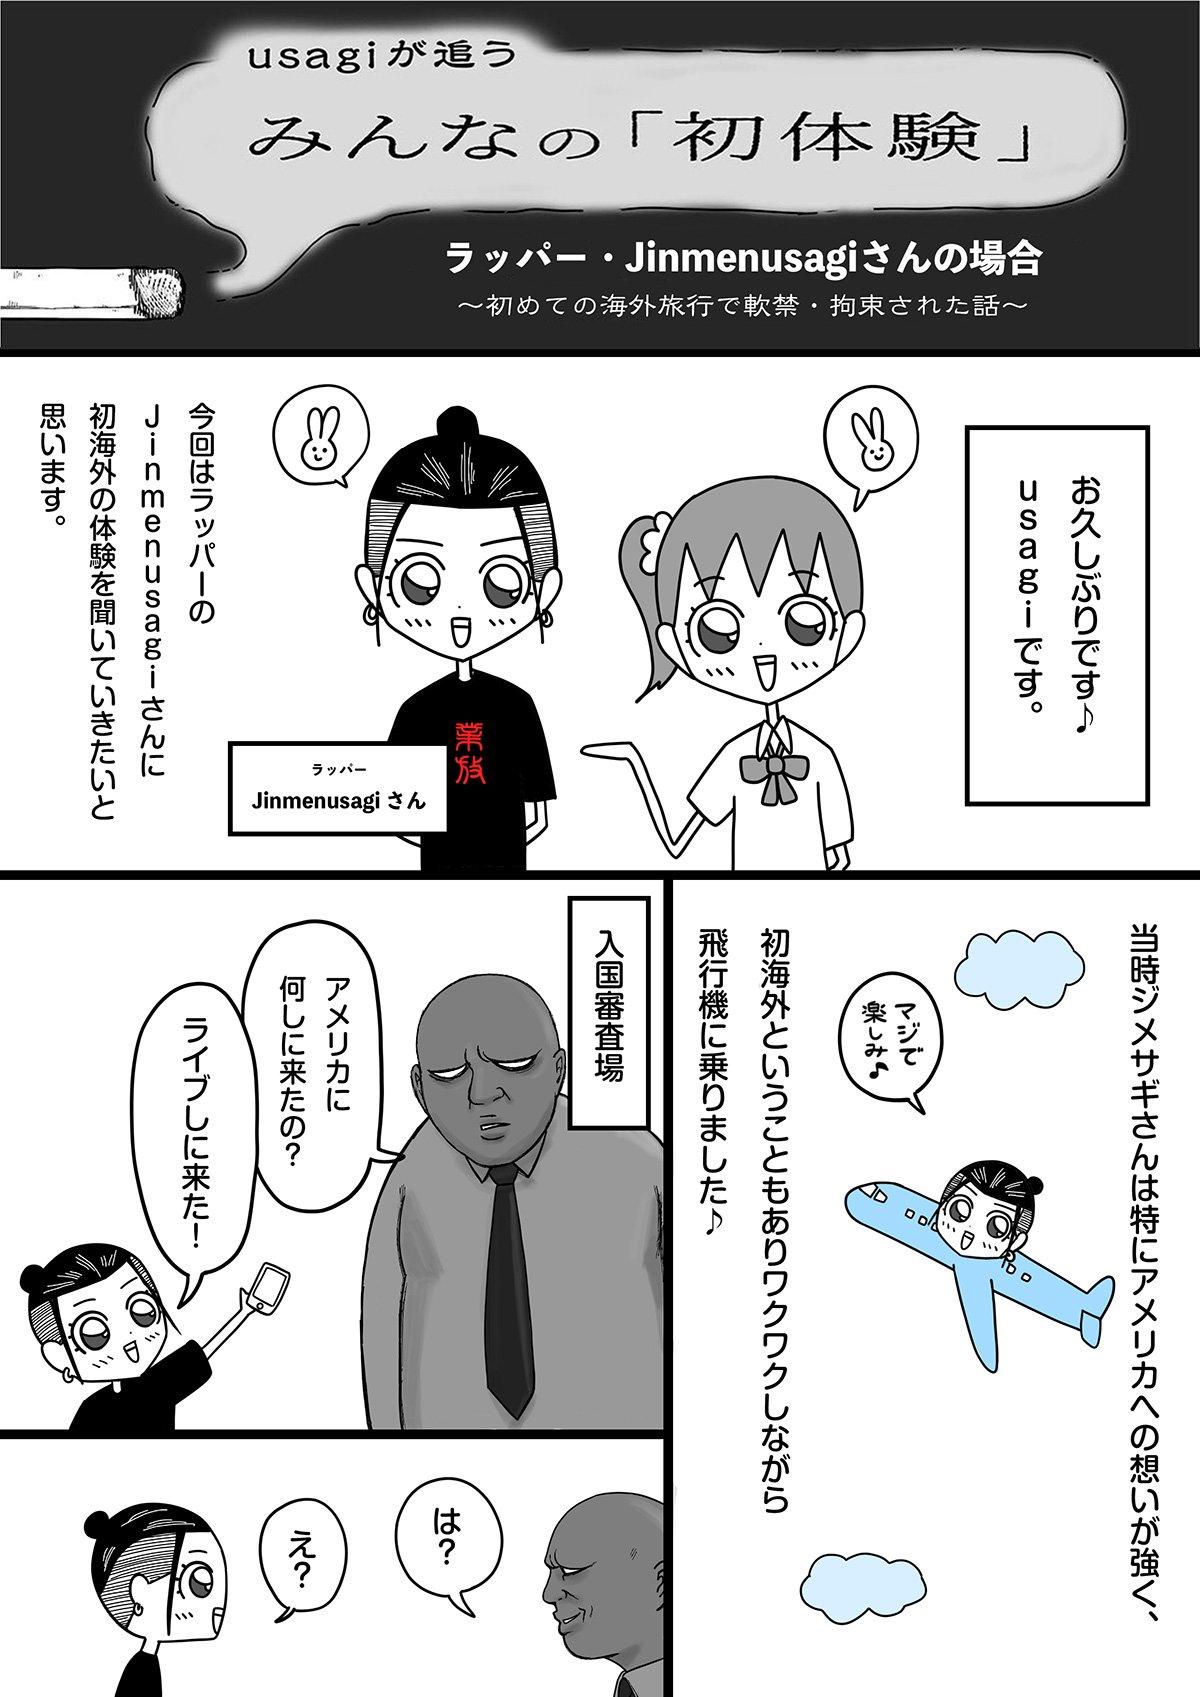 usagi_jinmenusagi_1.jpg